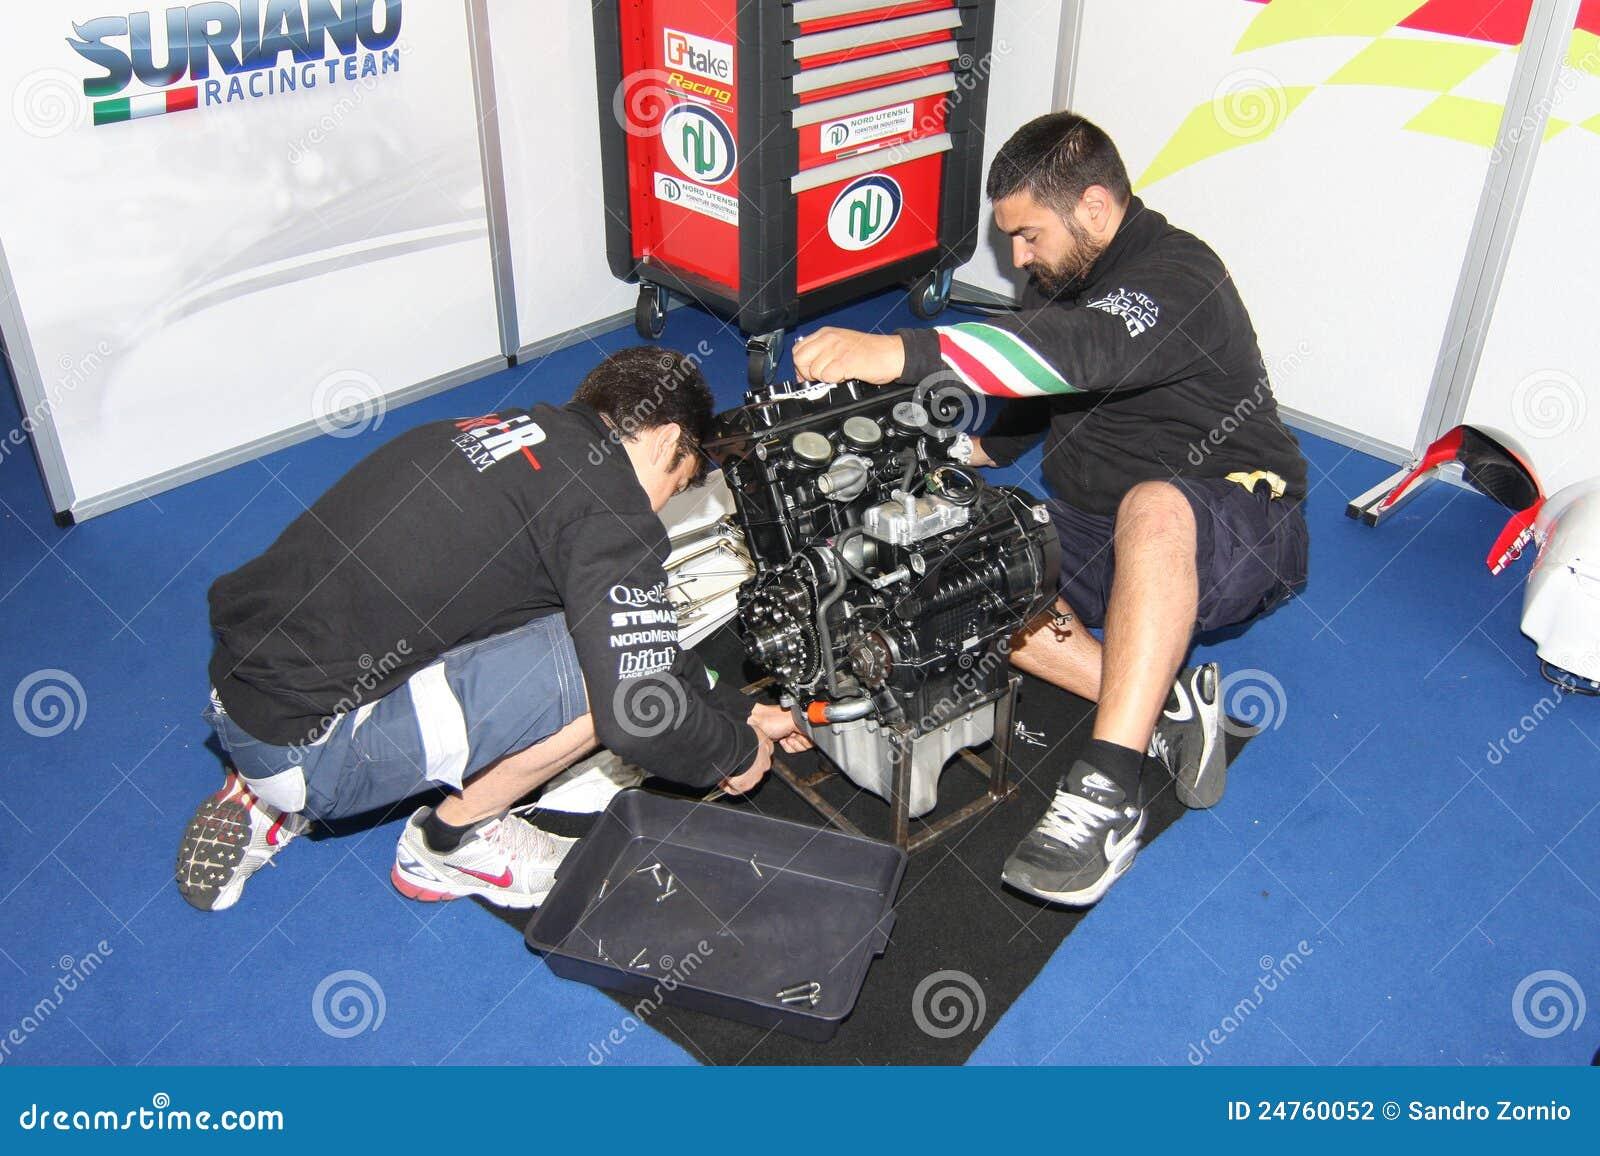 Triumph Daytona 675 Power Team by Suriano WSS